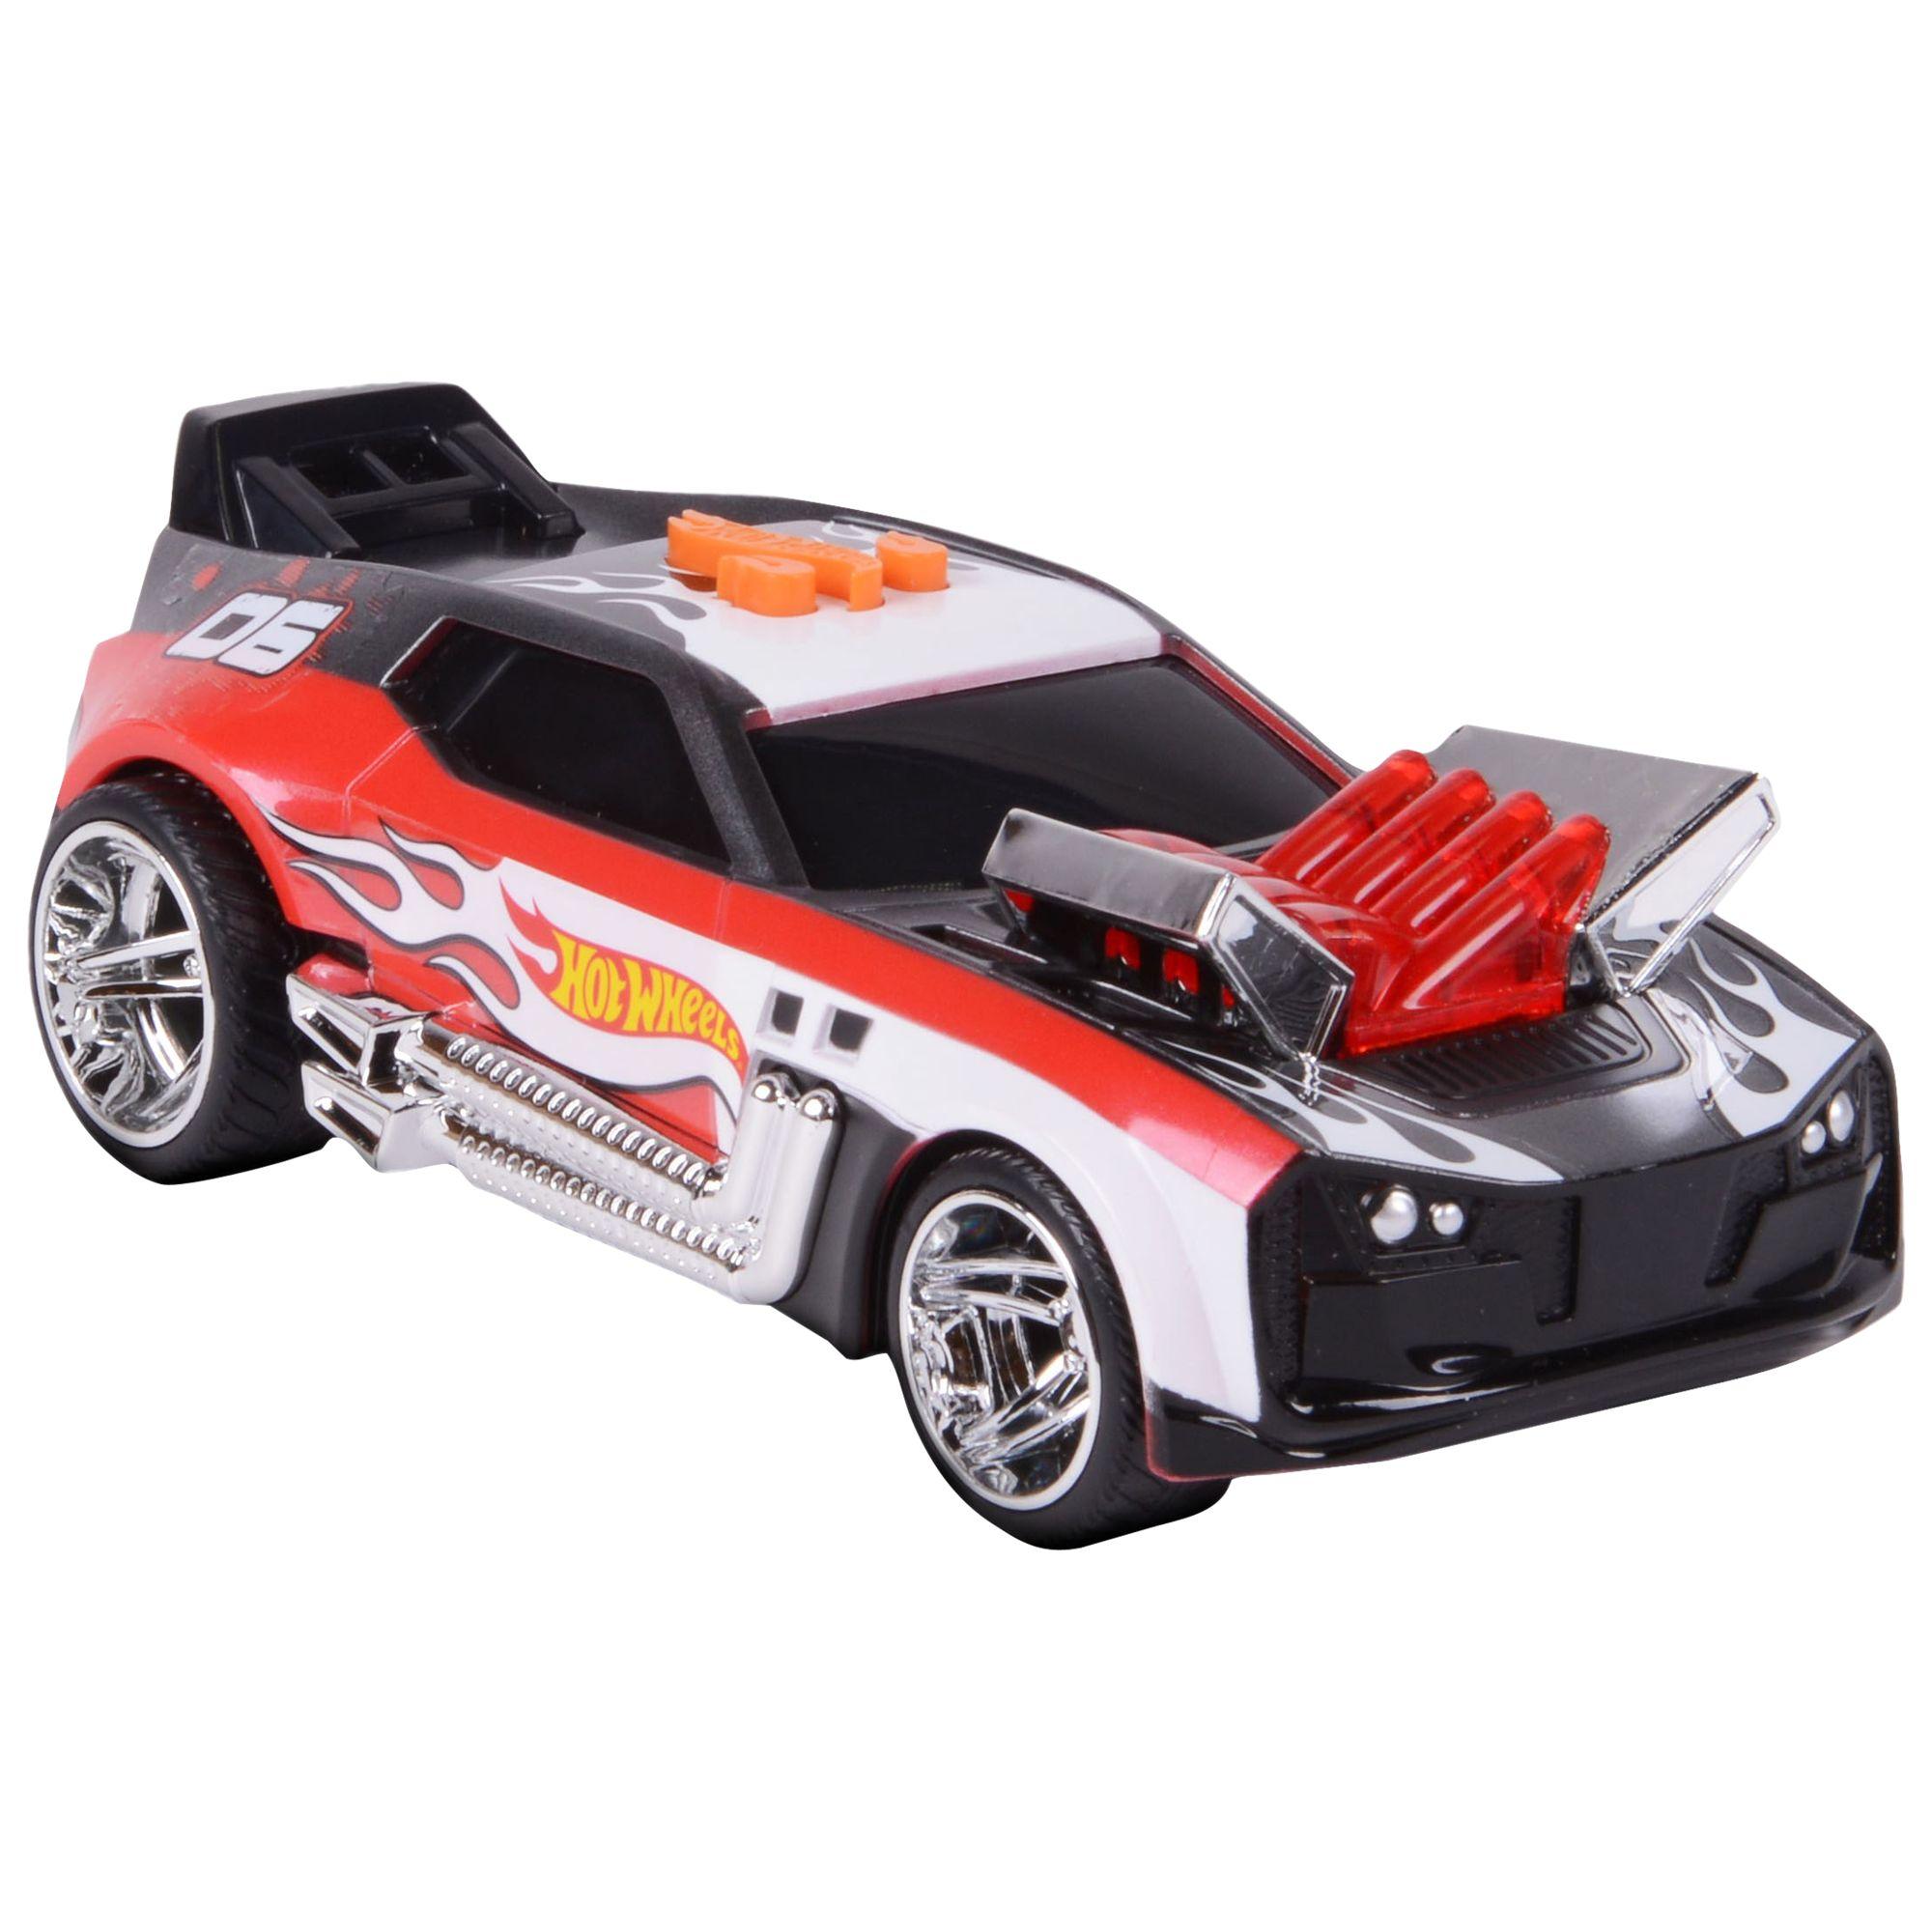 Hot Wheels Hot Wheels Flash Drifter Light and Sound Twinduction